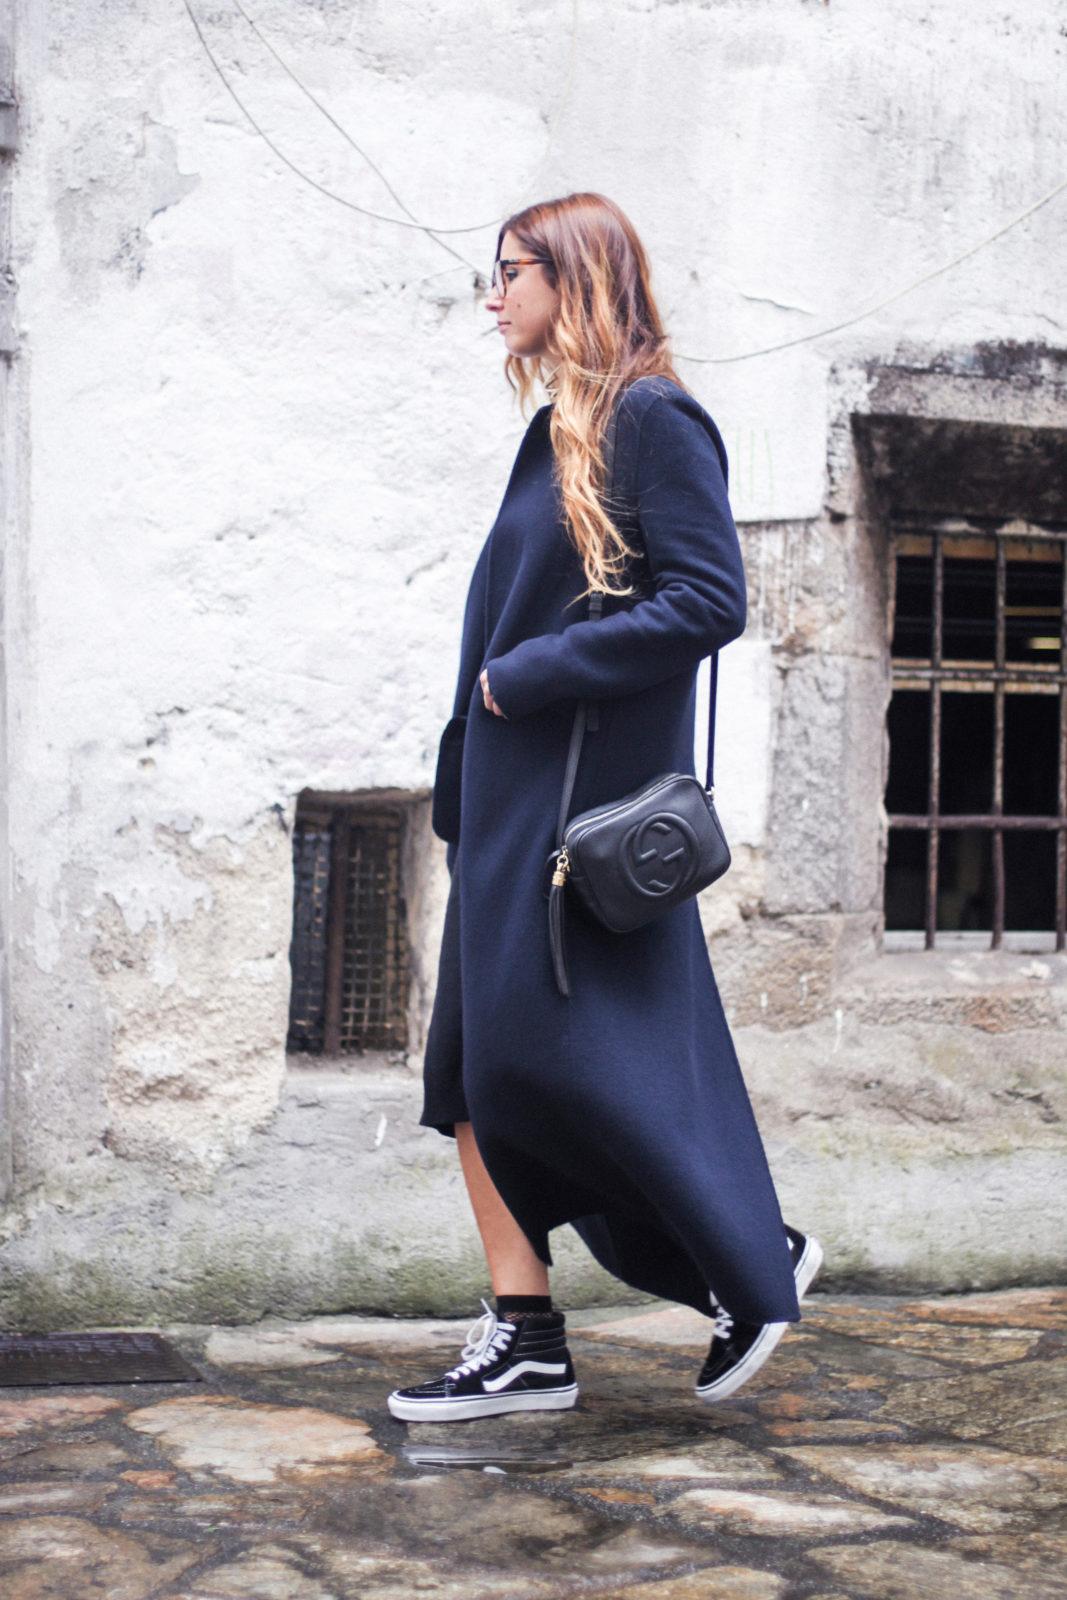 vestido_de_punto_midi_vans_calcetines_rejilla_choker_metalico_happiness_boutique_abrigo_largo_gucci_street_style_fall_2016_donkeycool-5